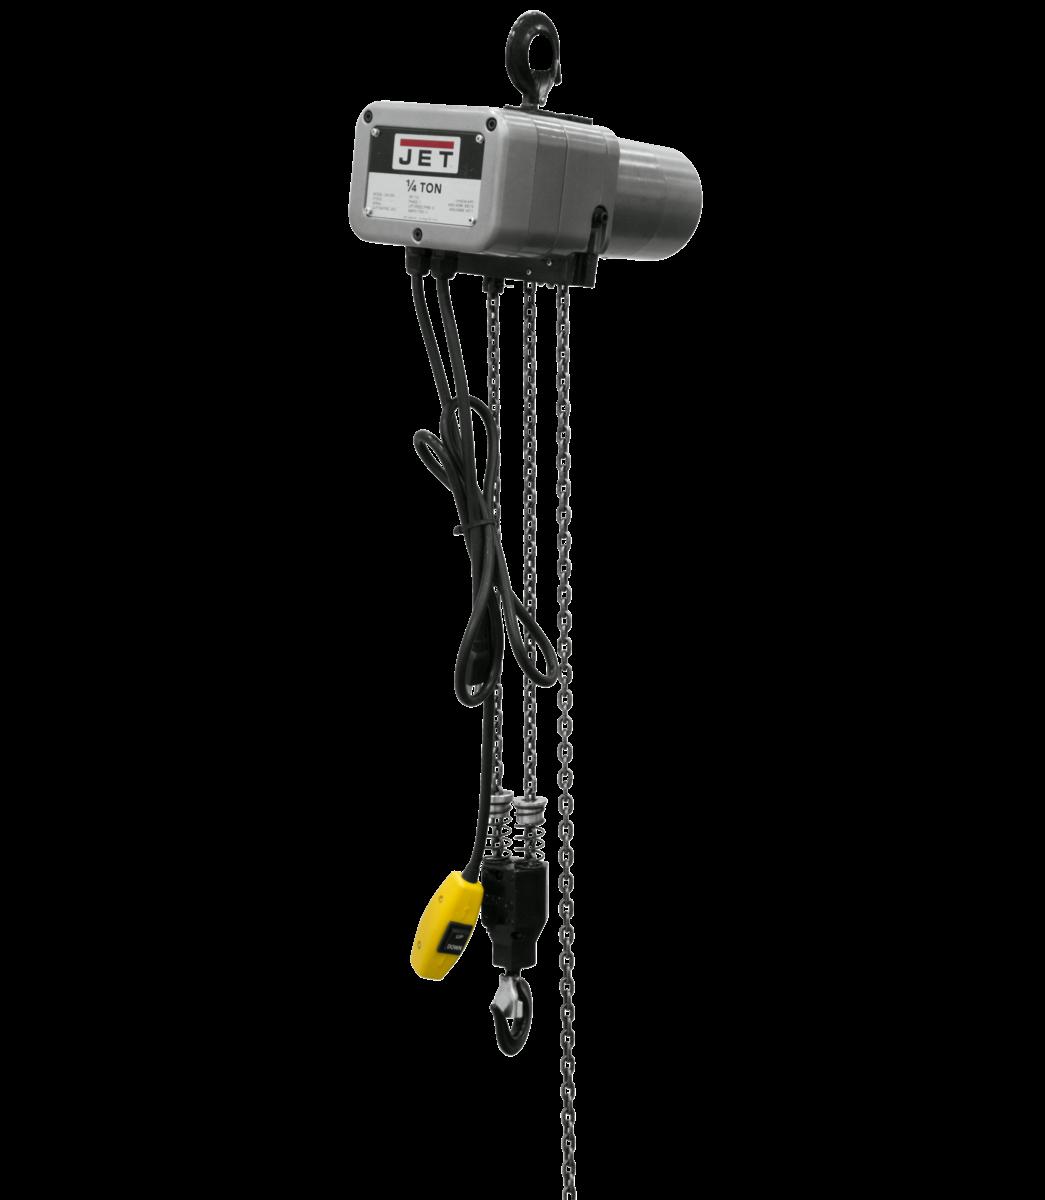 JSH-550-15 1/4-Ton Electric Chain Hoist 1-Phase 15' lift